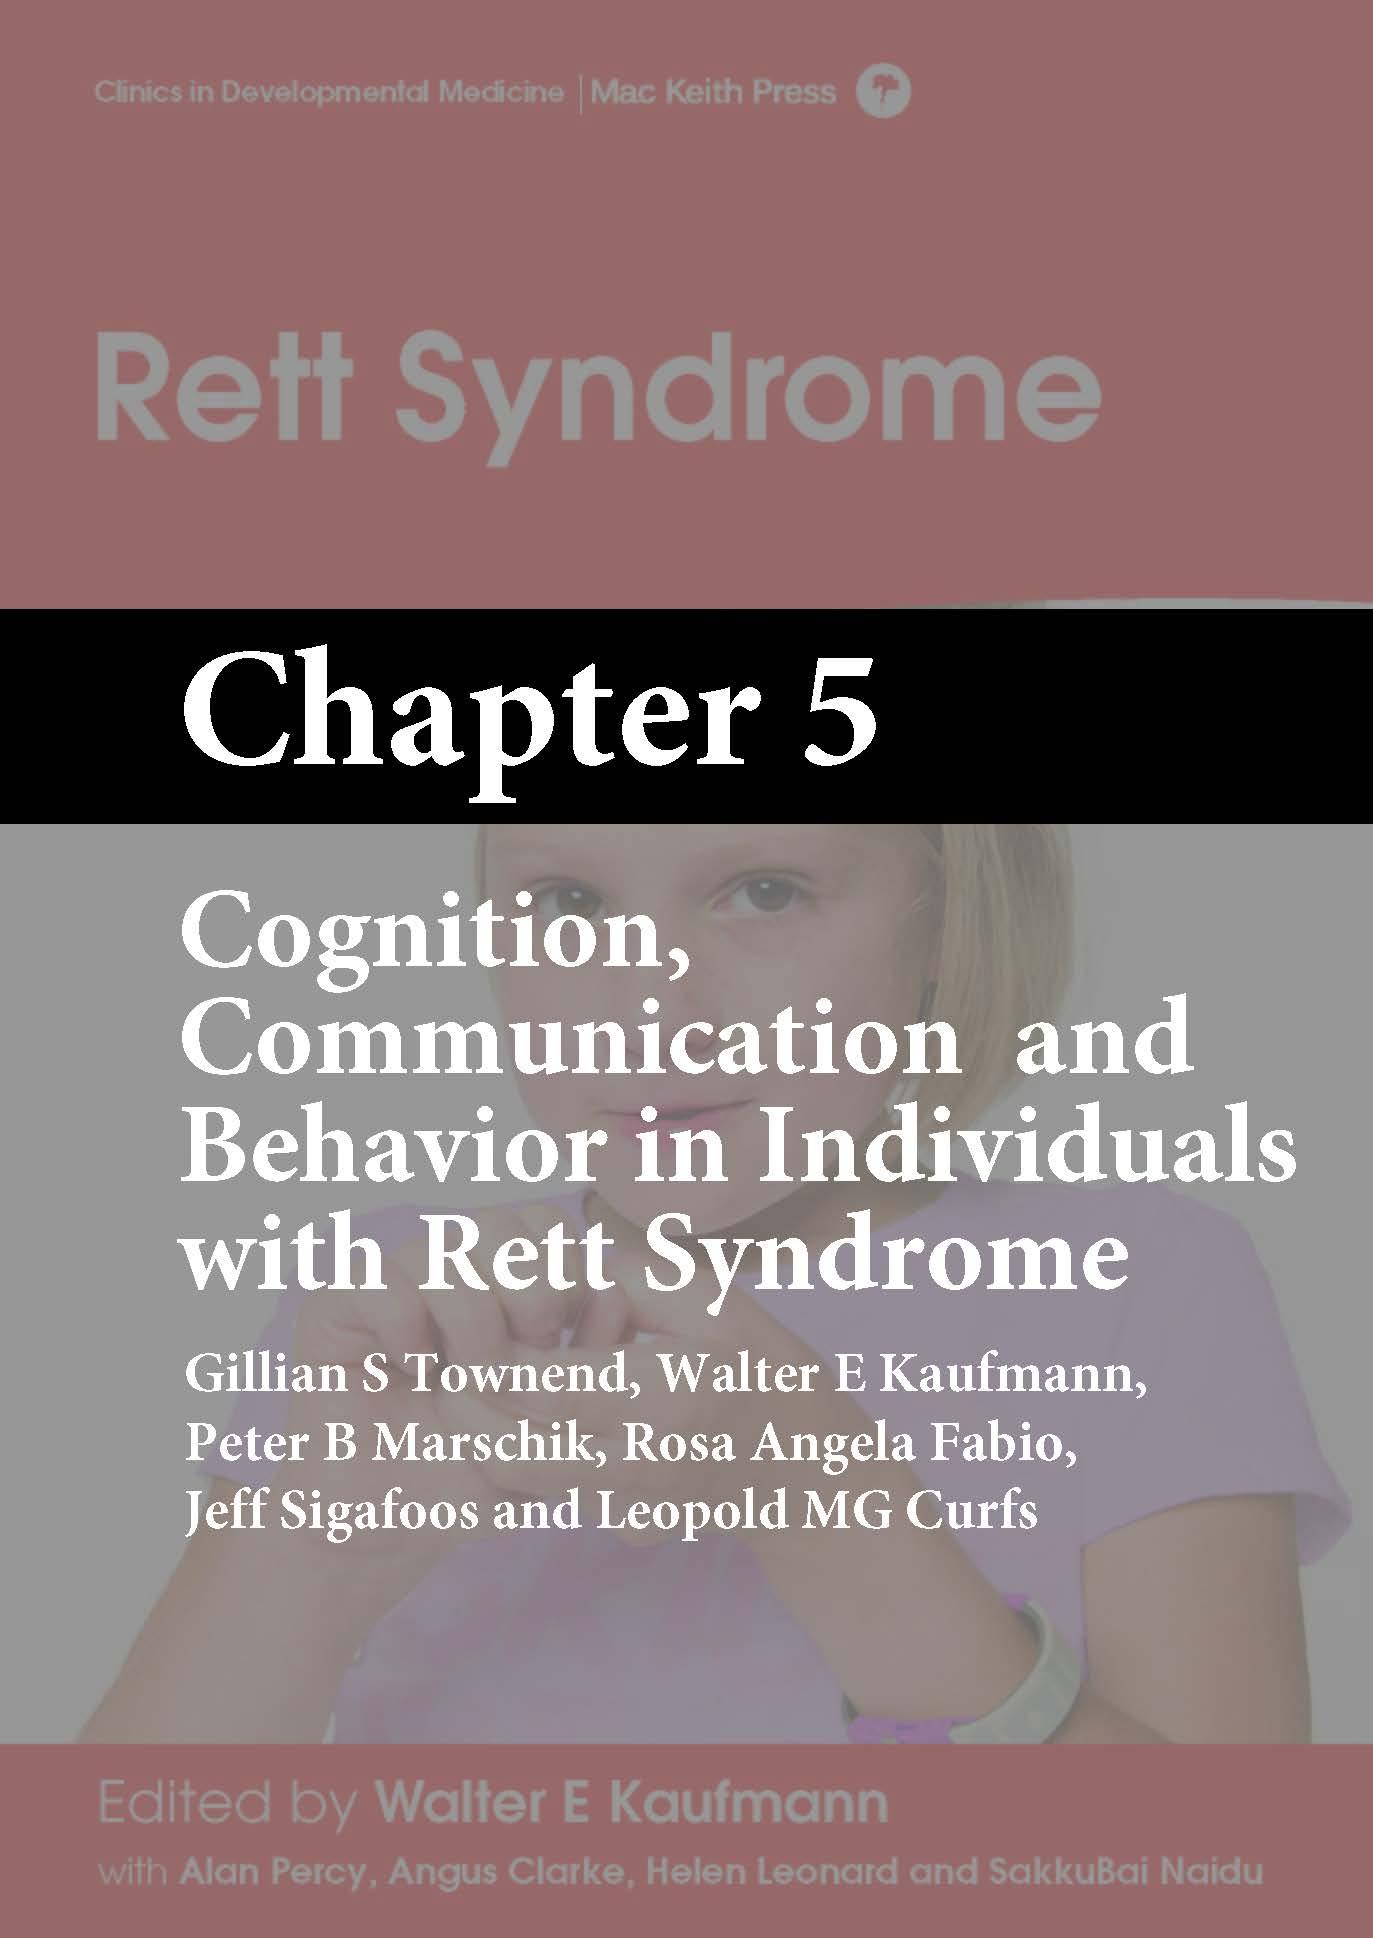 Rett Syndrome, Kaufmann, Chapter 5 cover